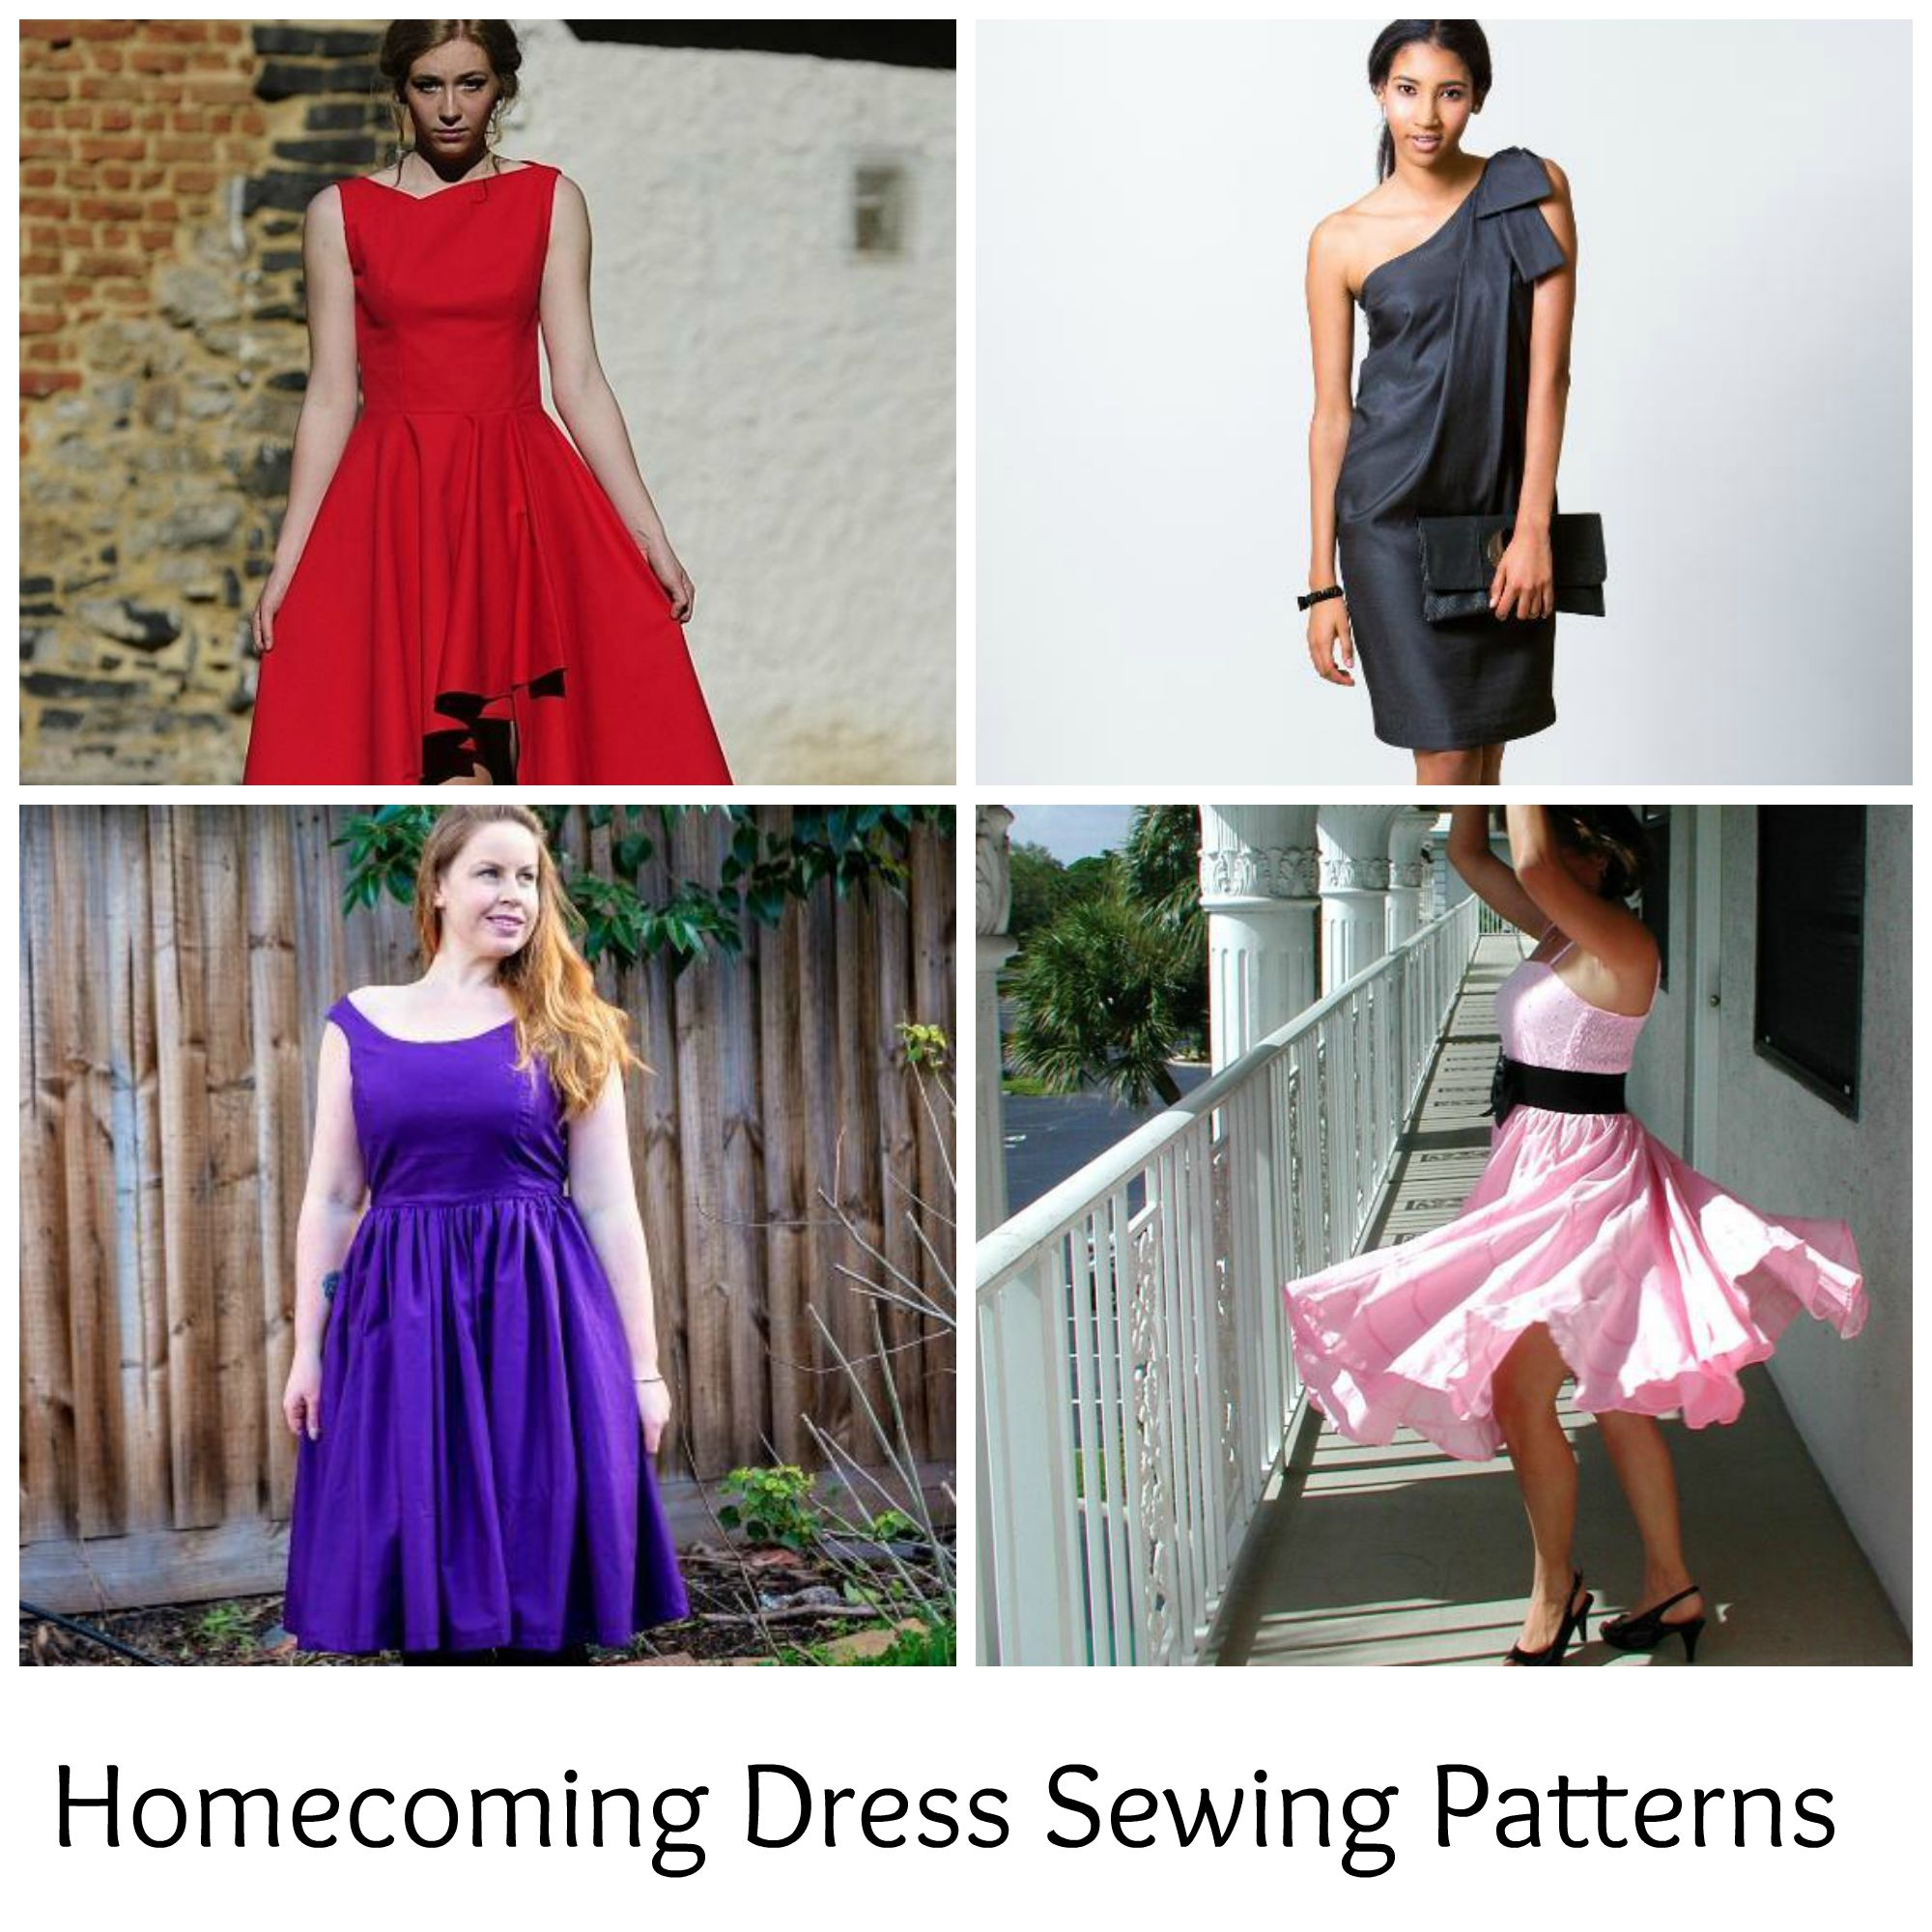 Homecoming Dress Sewing Patterns